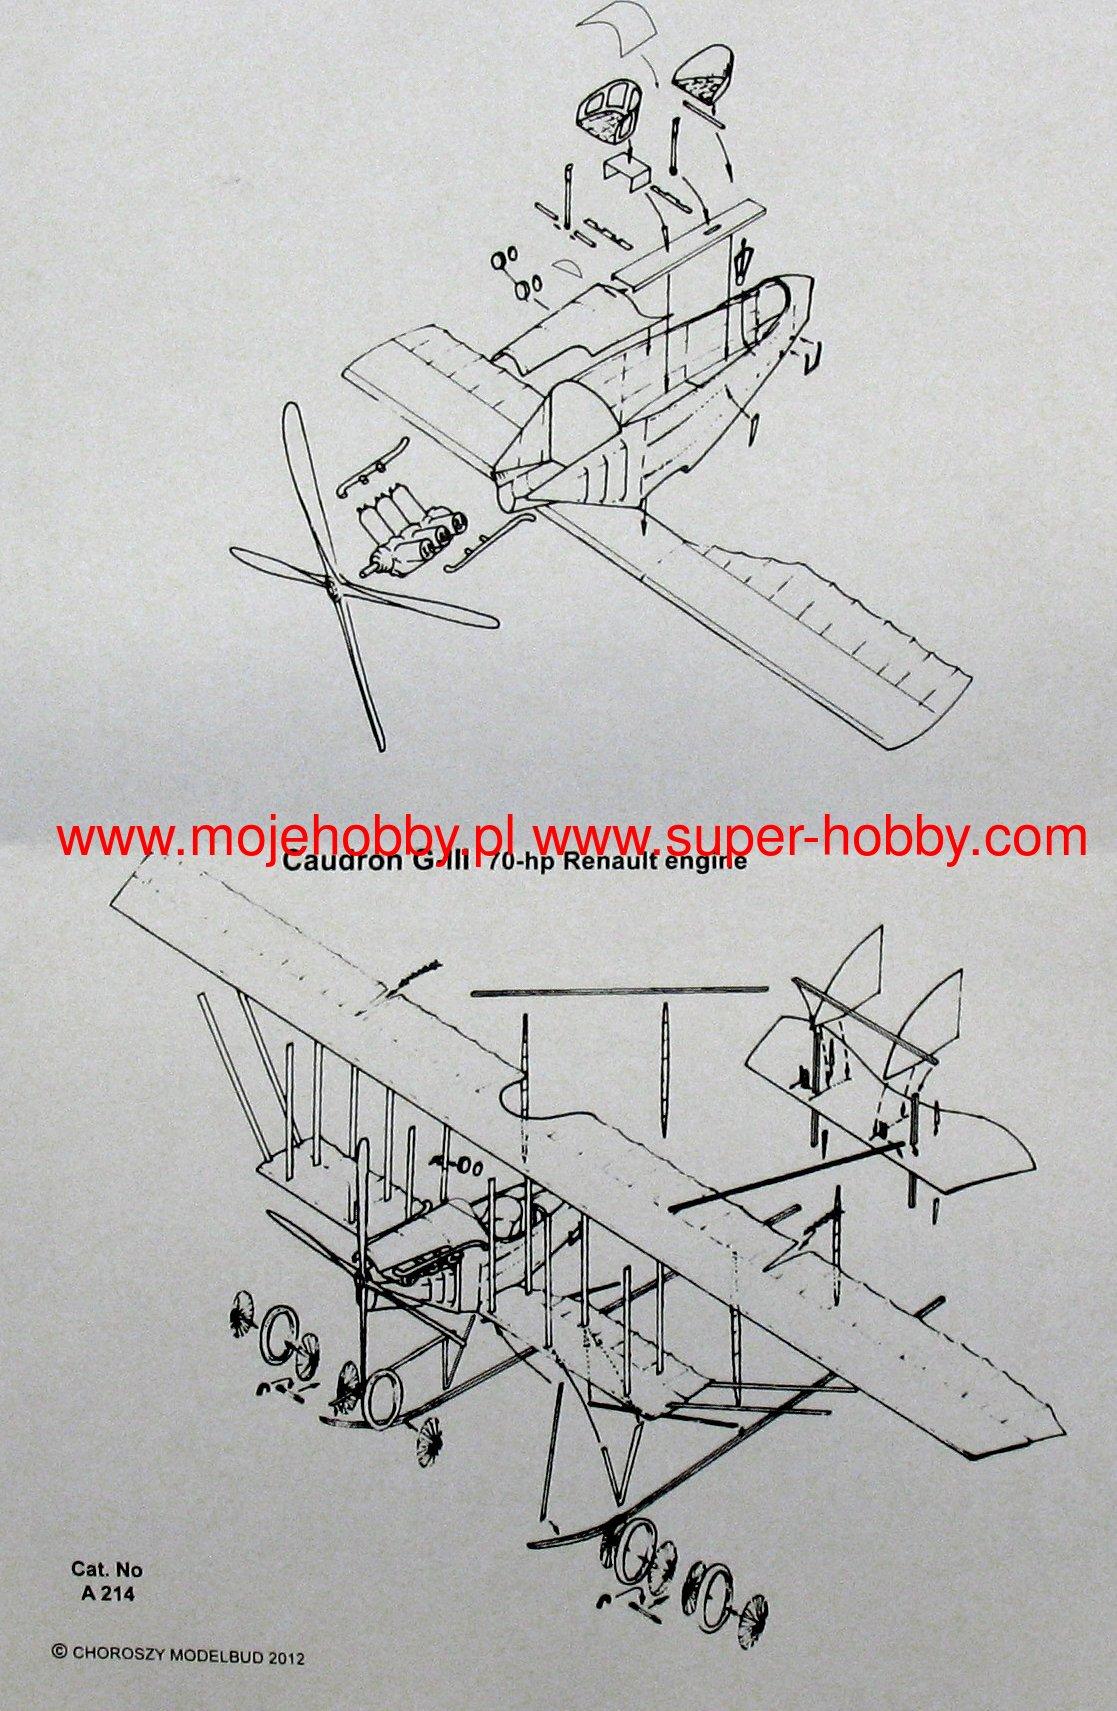 Caudron G Iii Renault Engine Choroszy Modelbud A214 Diagrams